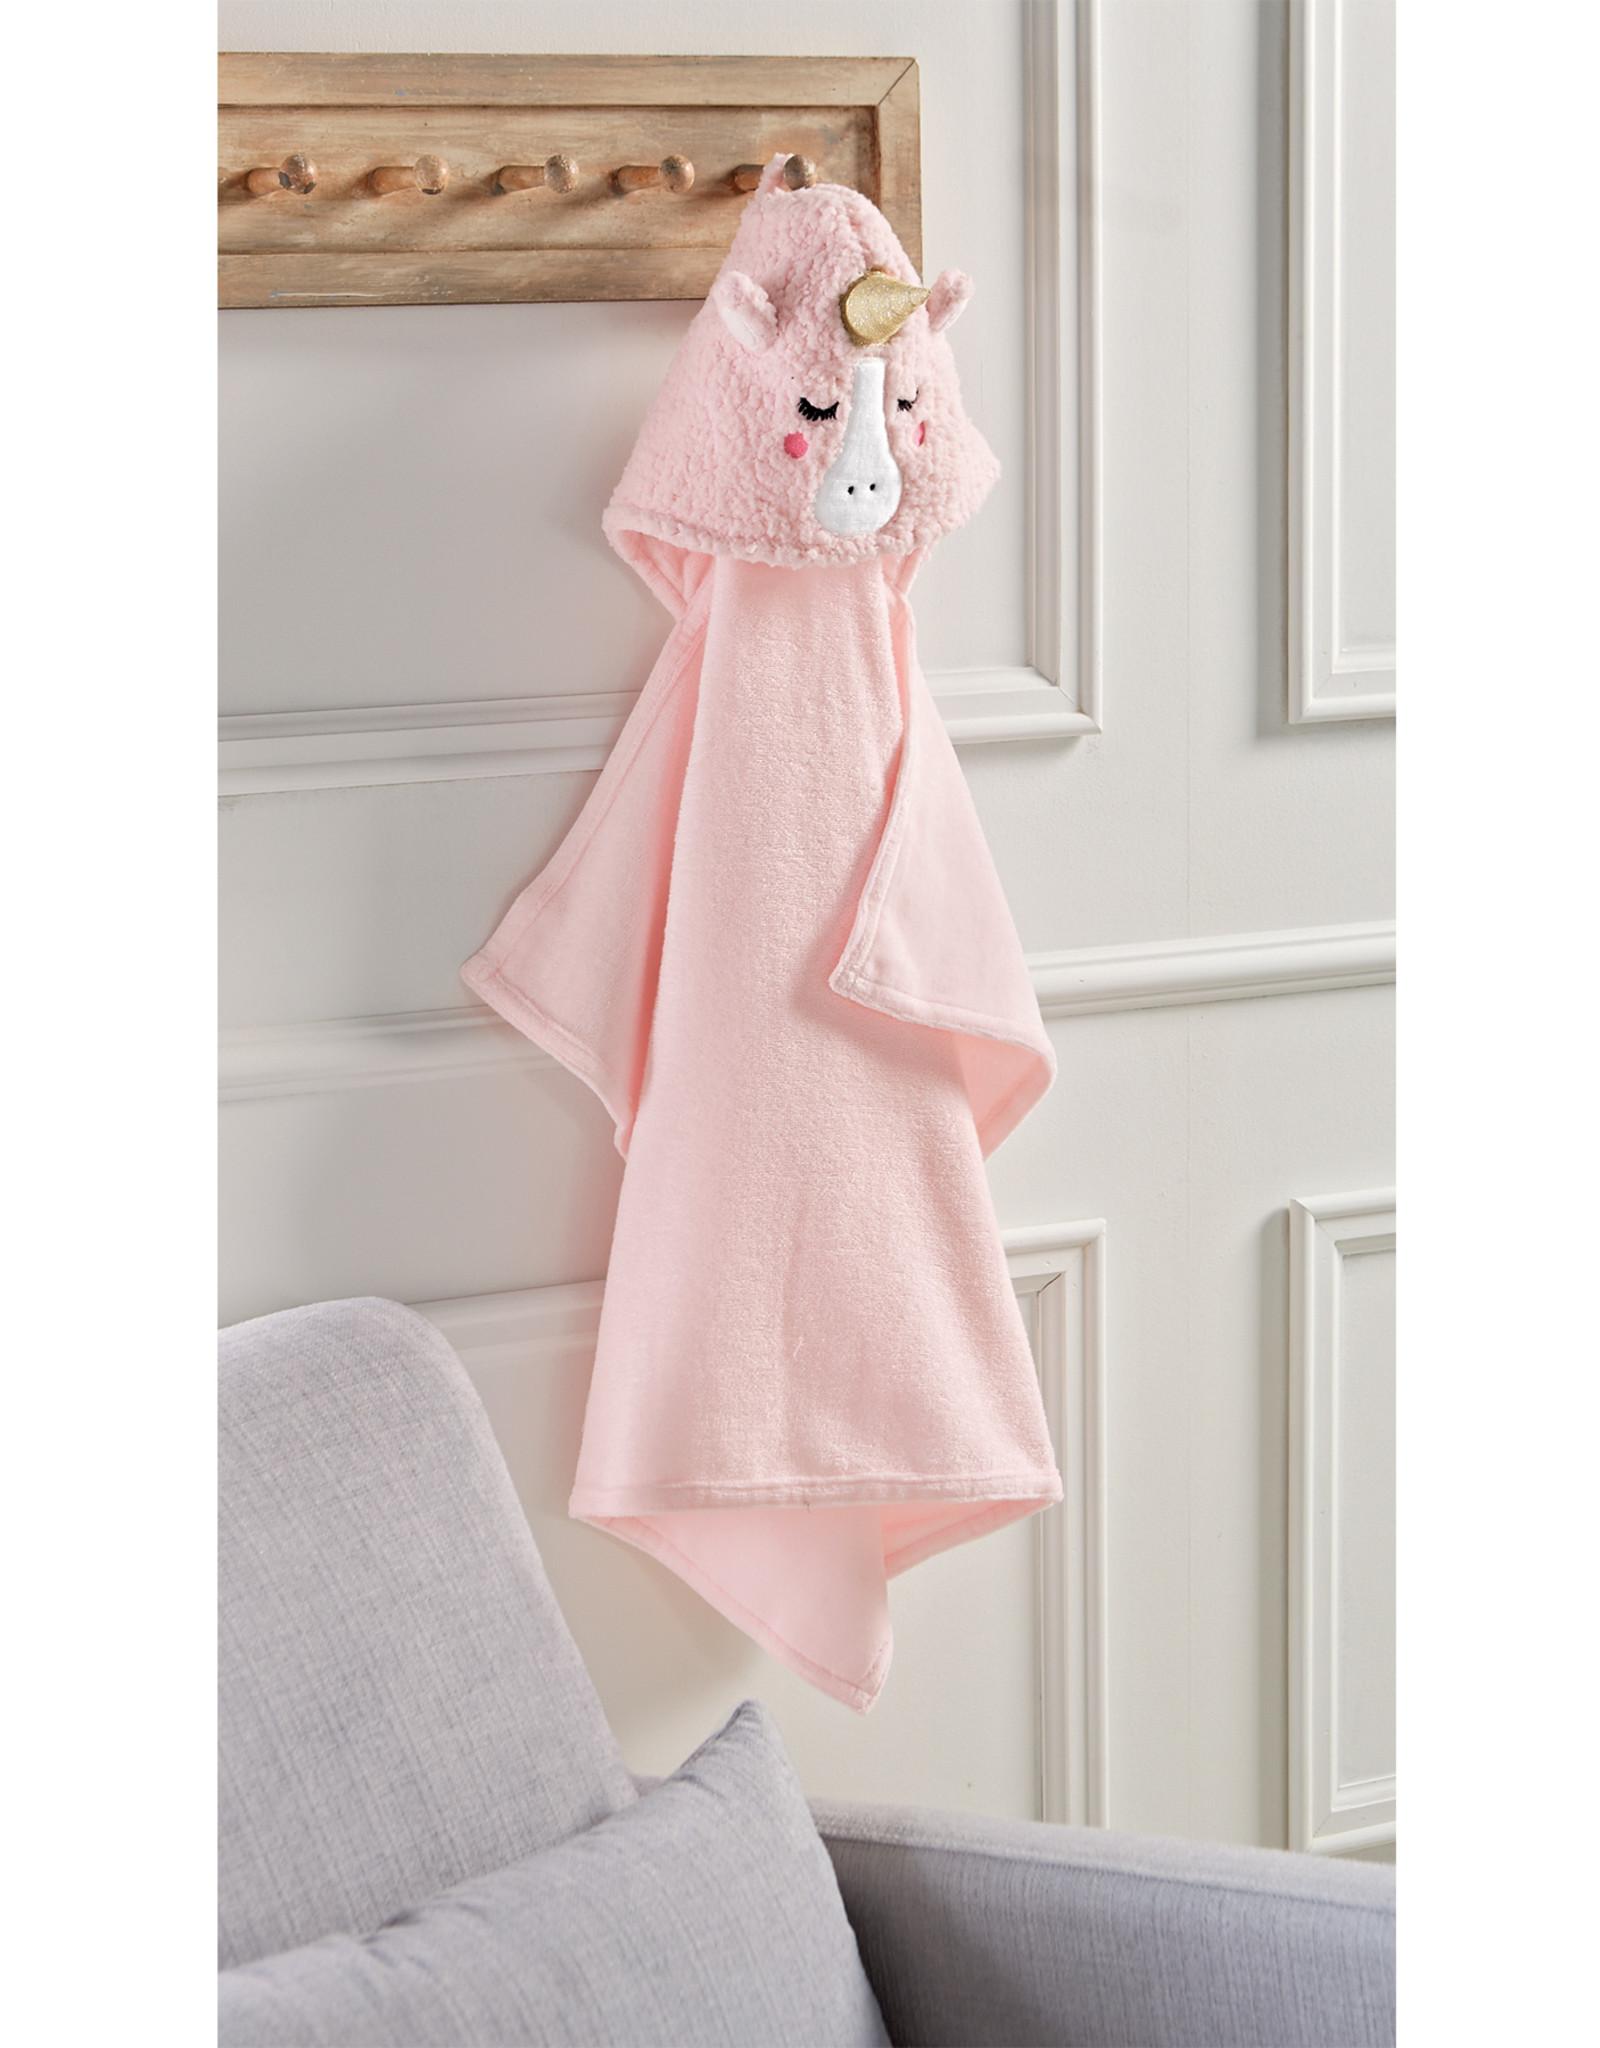 Mudpie Baby Unicorn Hooded Towel